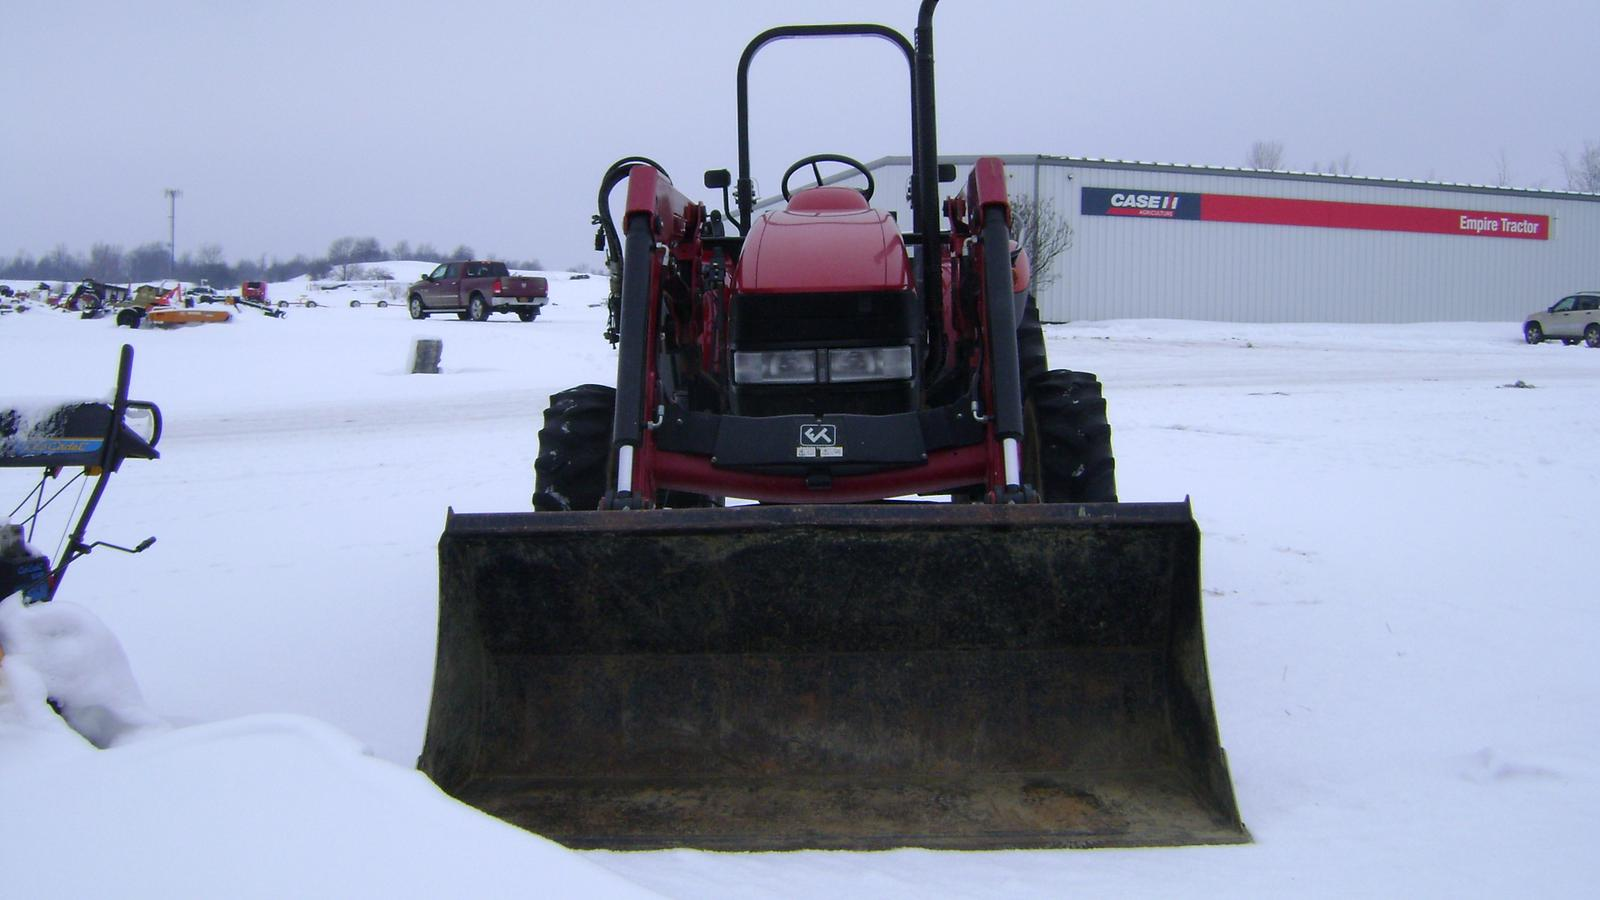 Z62600 Case IH JX60 Tractor (2) (1) case ih jx60 for sale in cazenovia, ny empire tractor, inc